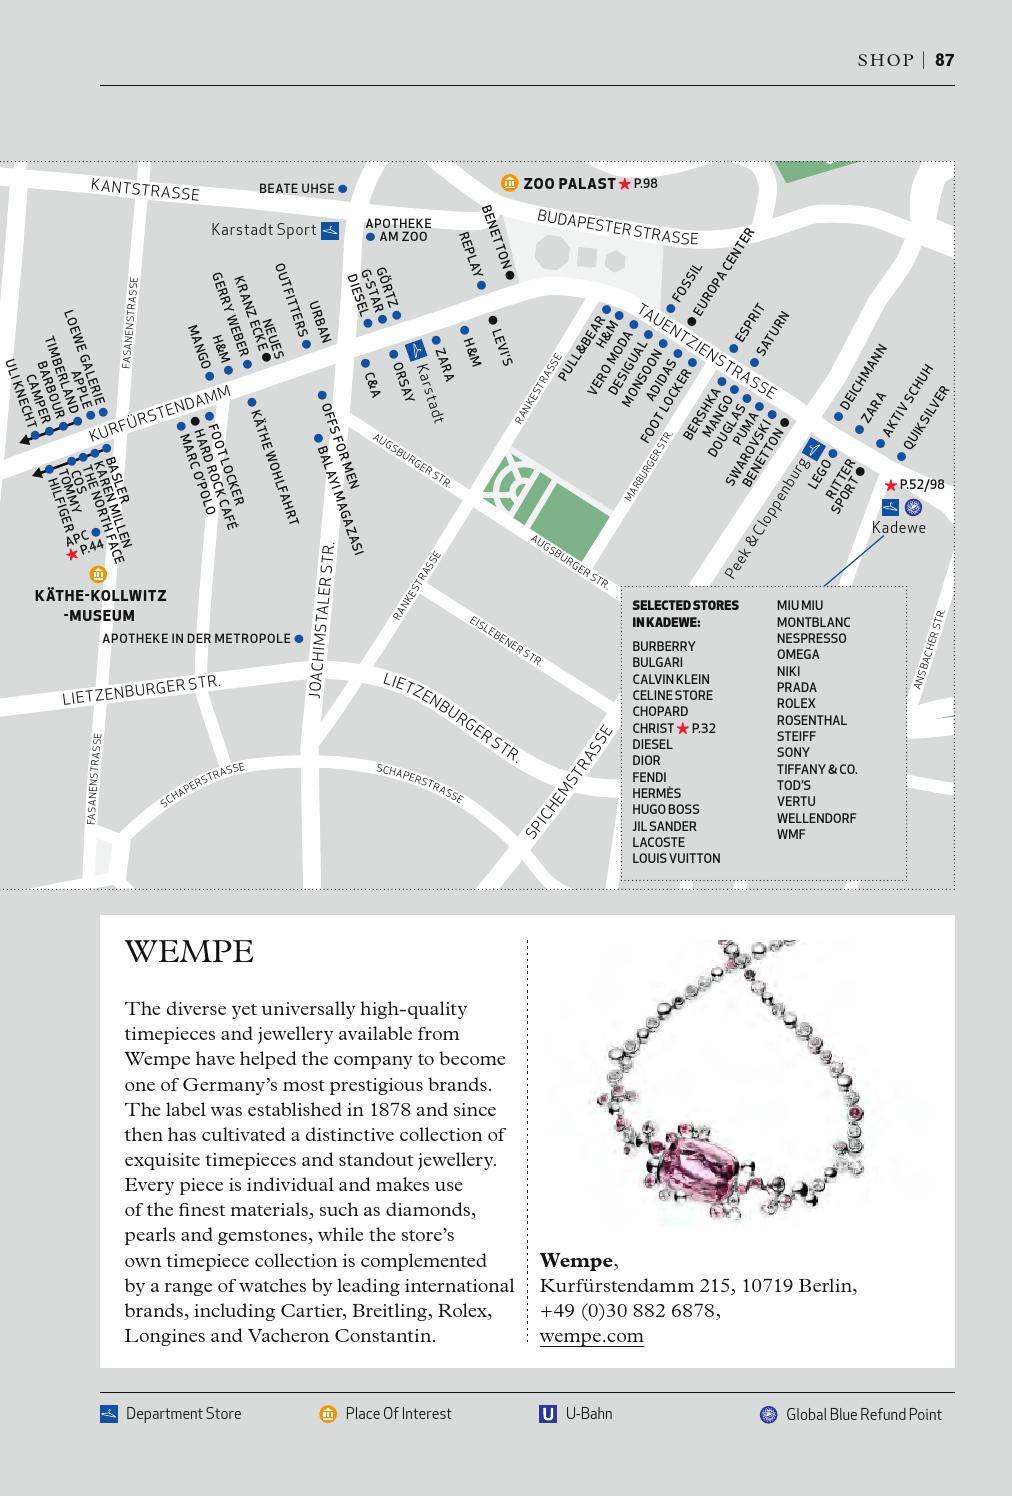 SHOP Berlin SS14 by SHOP   Global Blue issuu